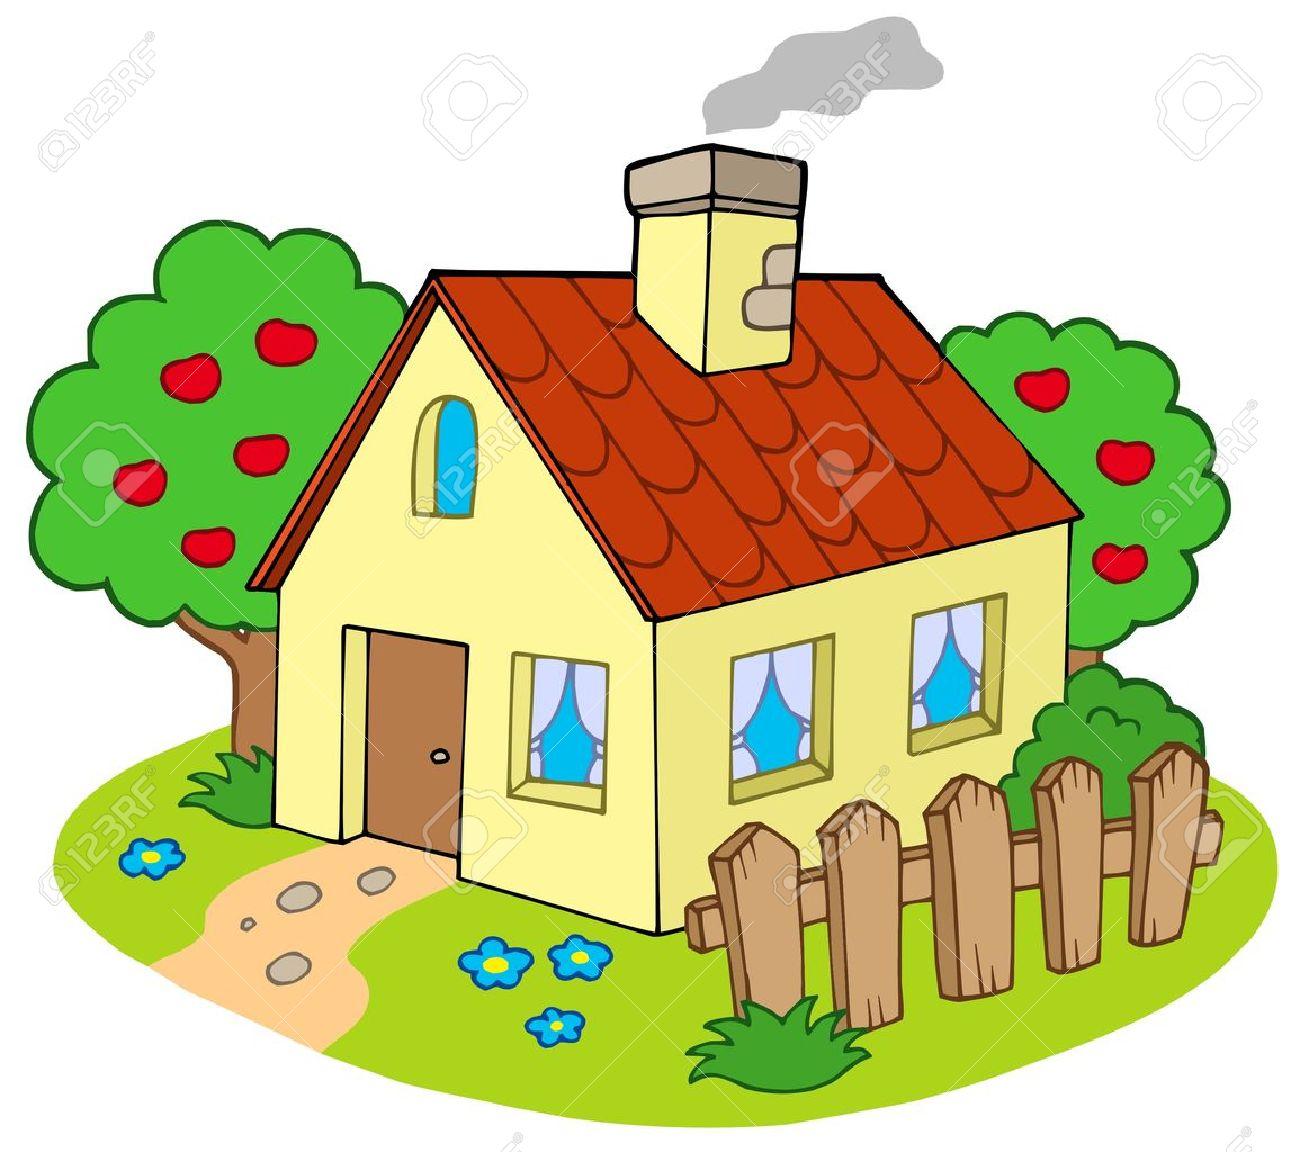 Hausbau clipart  Haus Vektor Lizenzfreie Vektorgrafiken Kaufen: 123RF